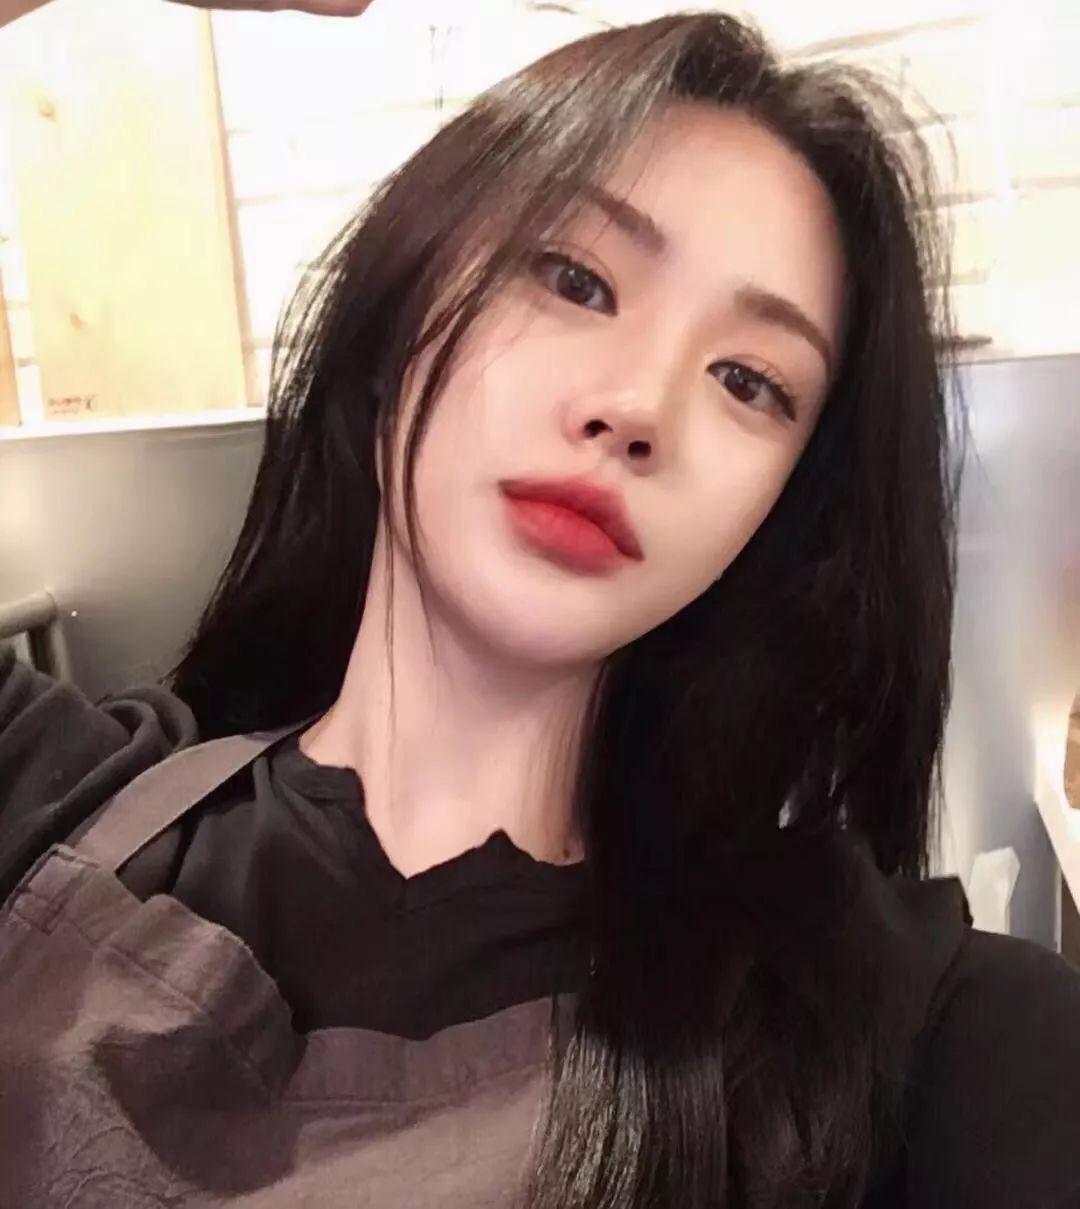 ulzzang icons | Tumblr | Ulzzang korean girl, Ulzzang girl selca, Ulzzang  girl